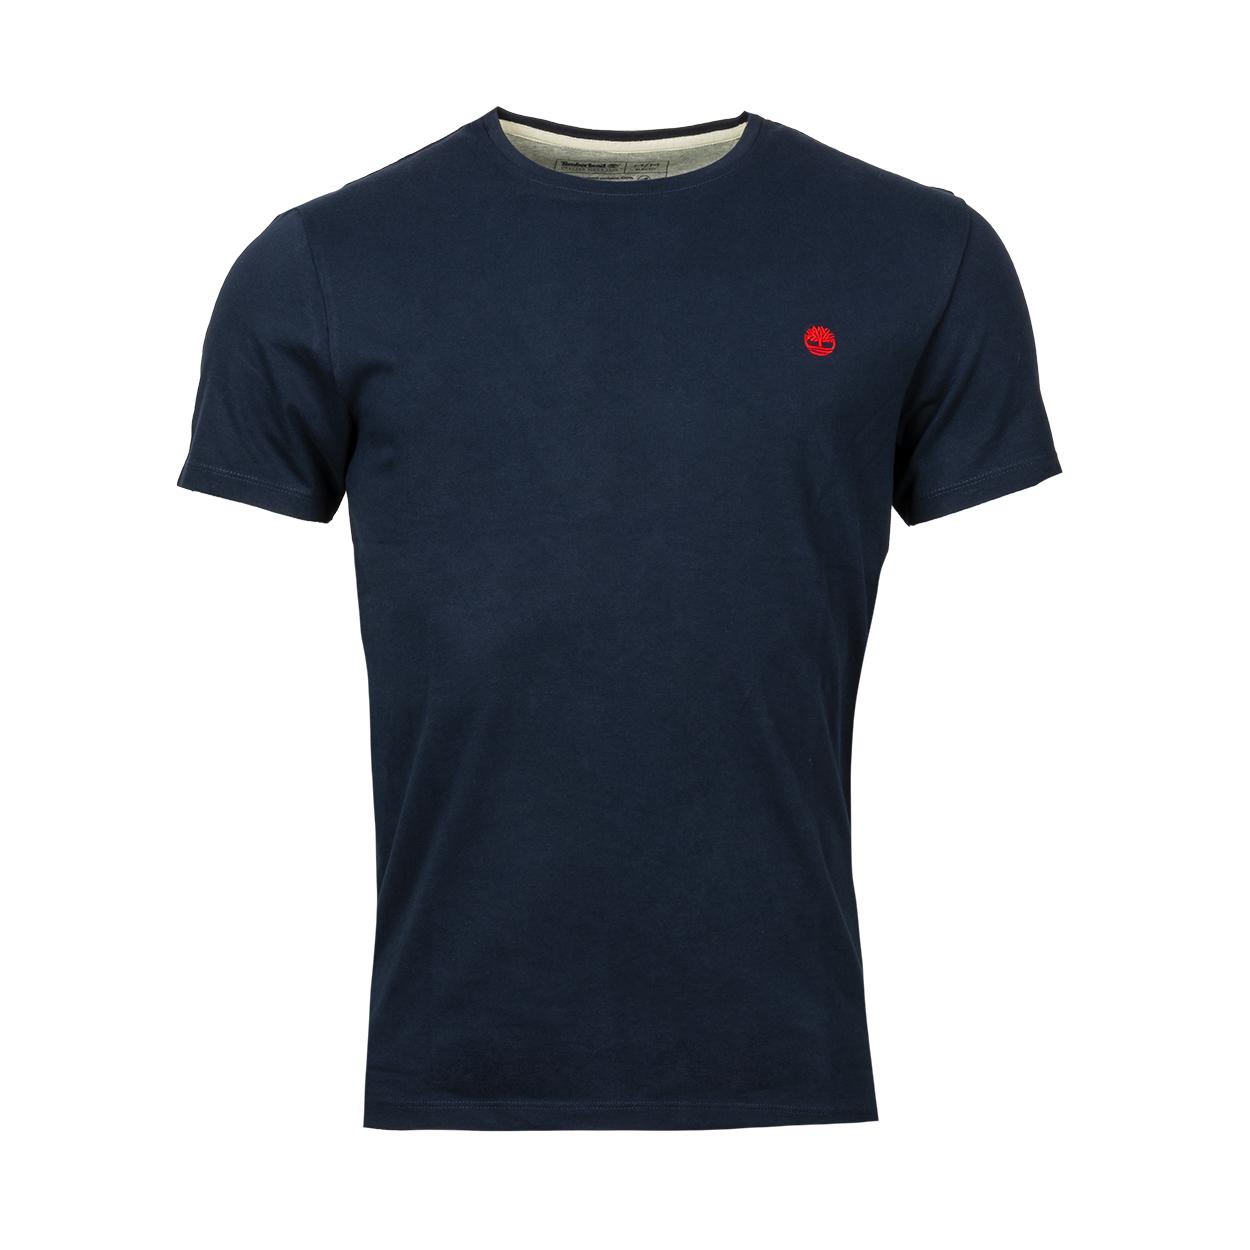 Tee-shirt col rond  en coton bleu nuit brodé